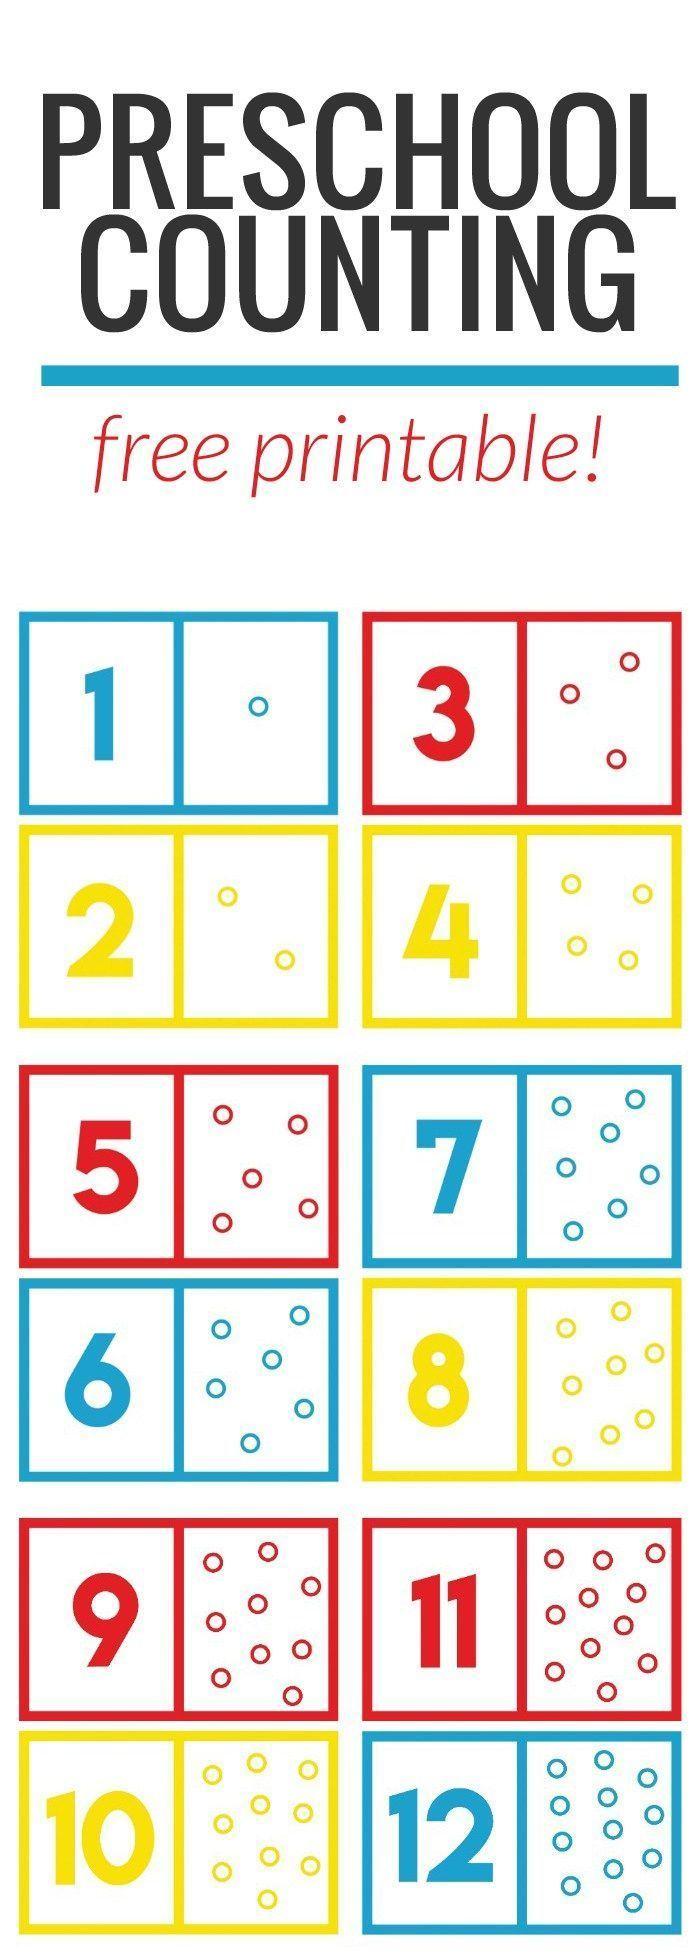 Preschool Math Counting Game + Free Printable Preschool